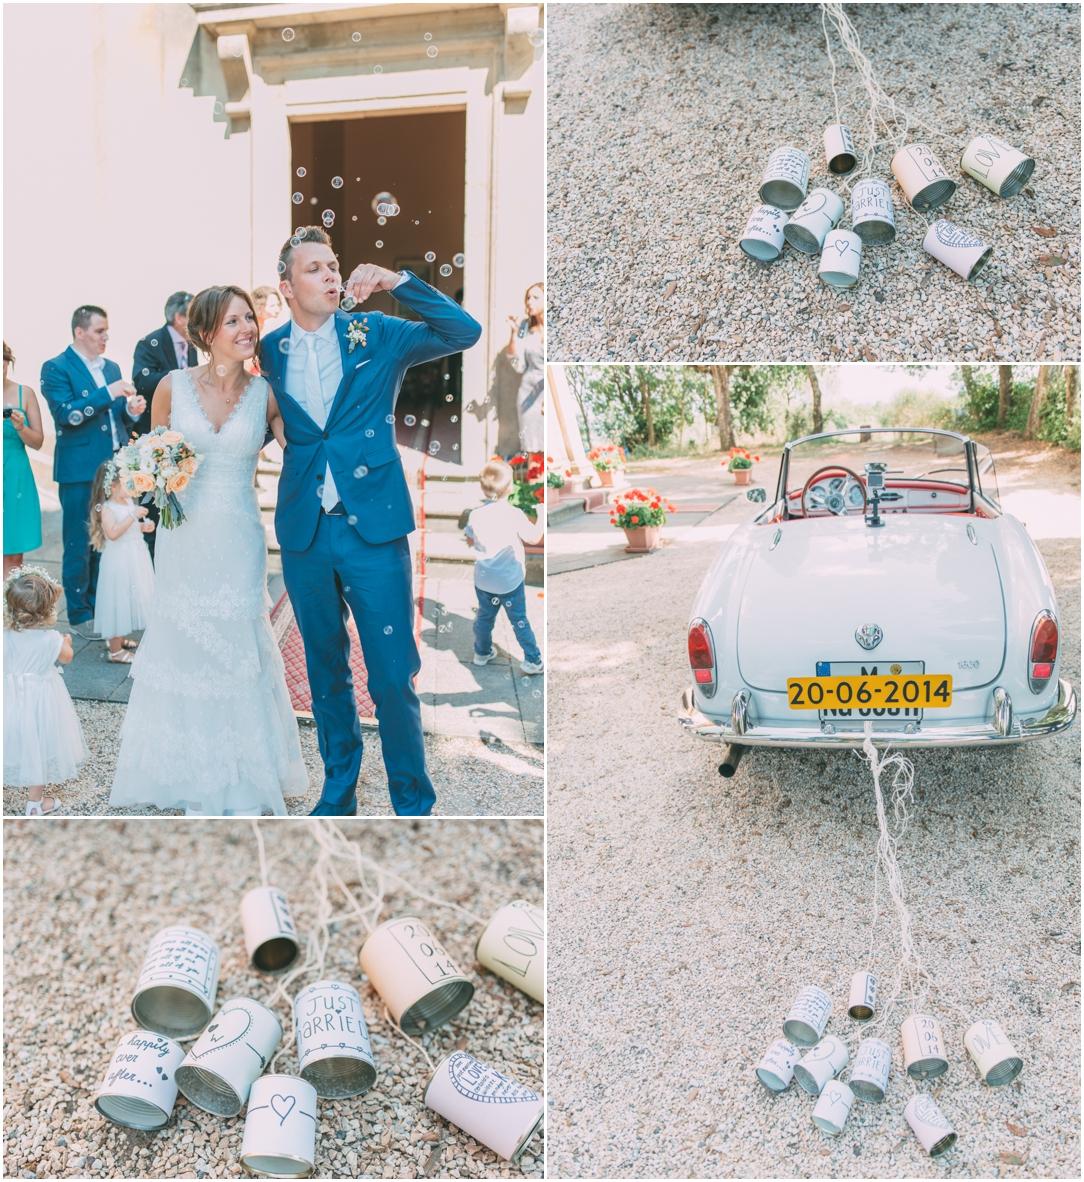 trouwen in toscane_flowers in Tuscany_tuscany wedding_0143.jpg